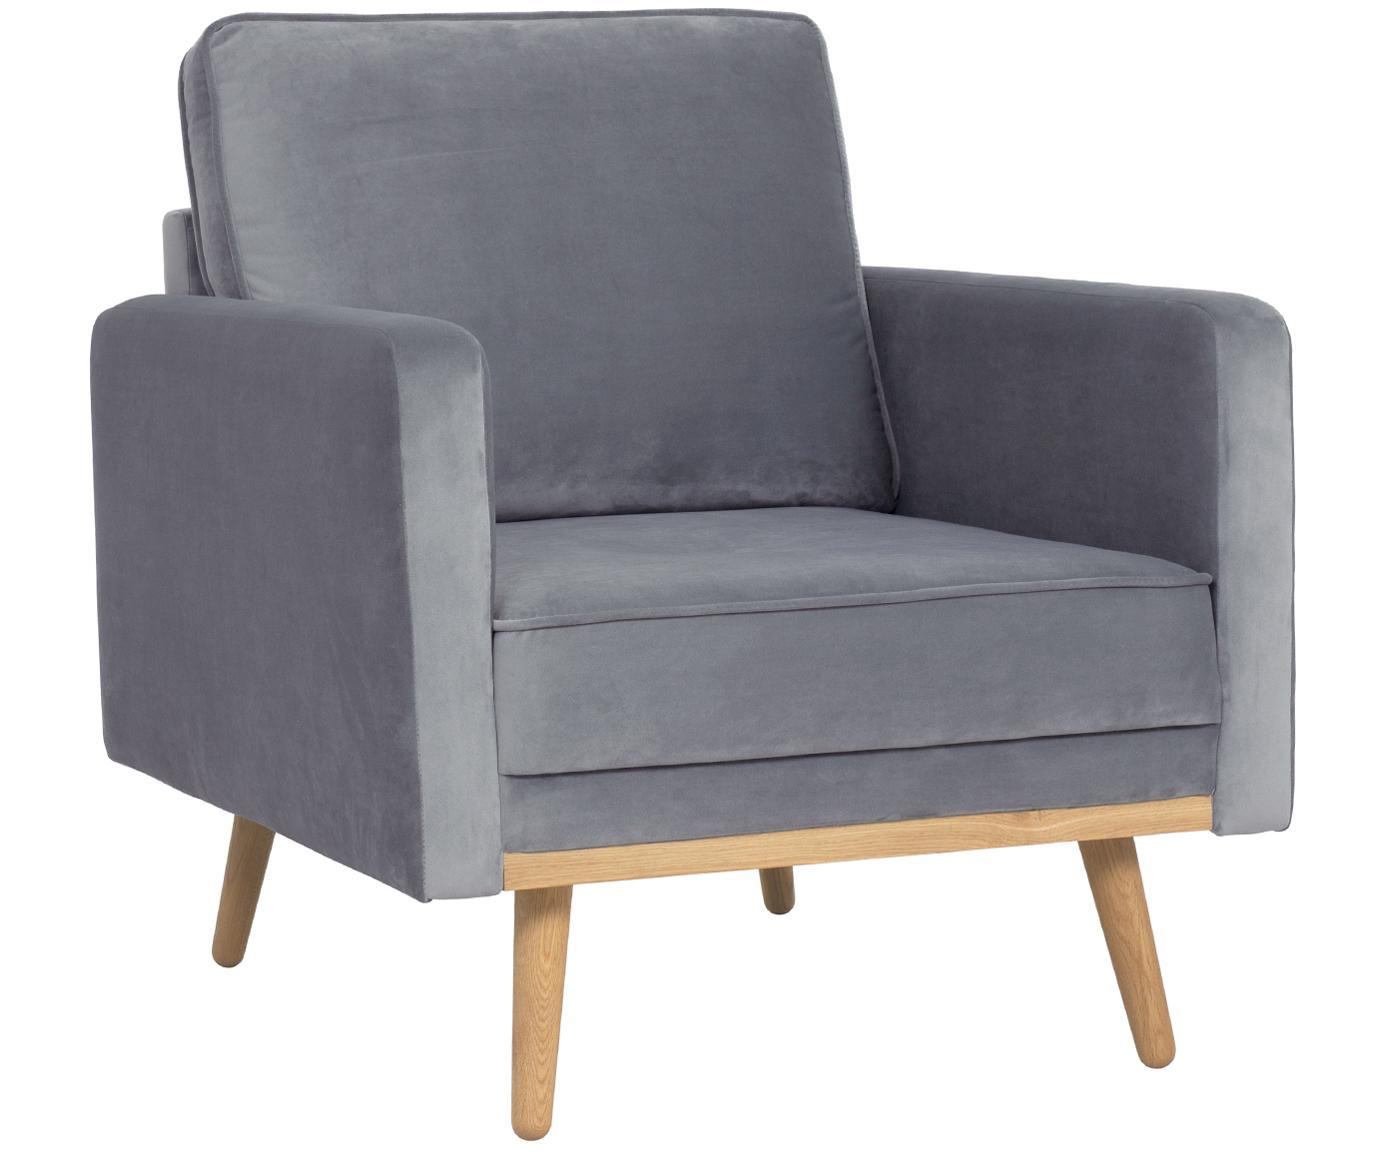 Fluwelen fauteuil Saint, Bekleding: fluweel (polyester), Frame: massief grenenhout, spaan, Bekleding: grijs. Poten en frame: eikenhoutkleurig, B 85 x D 76 cm